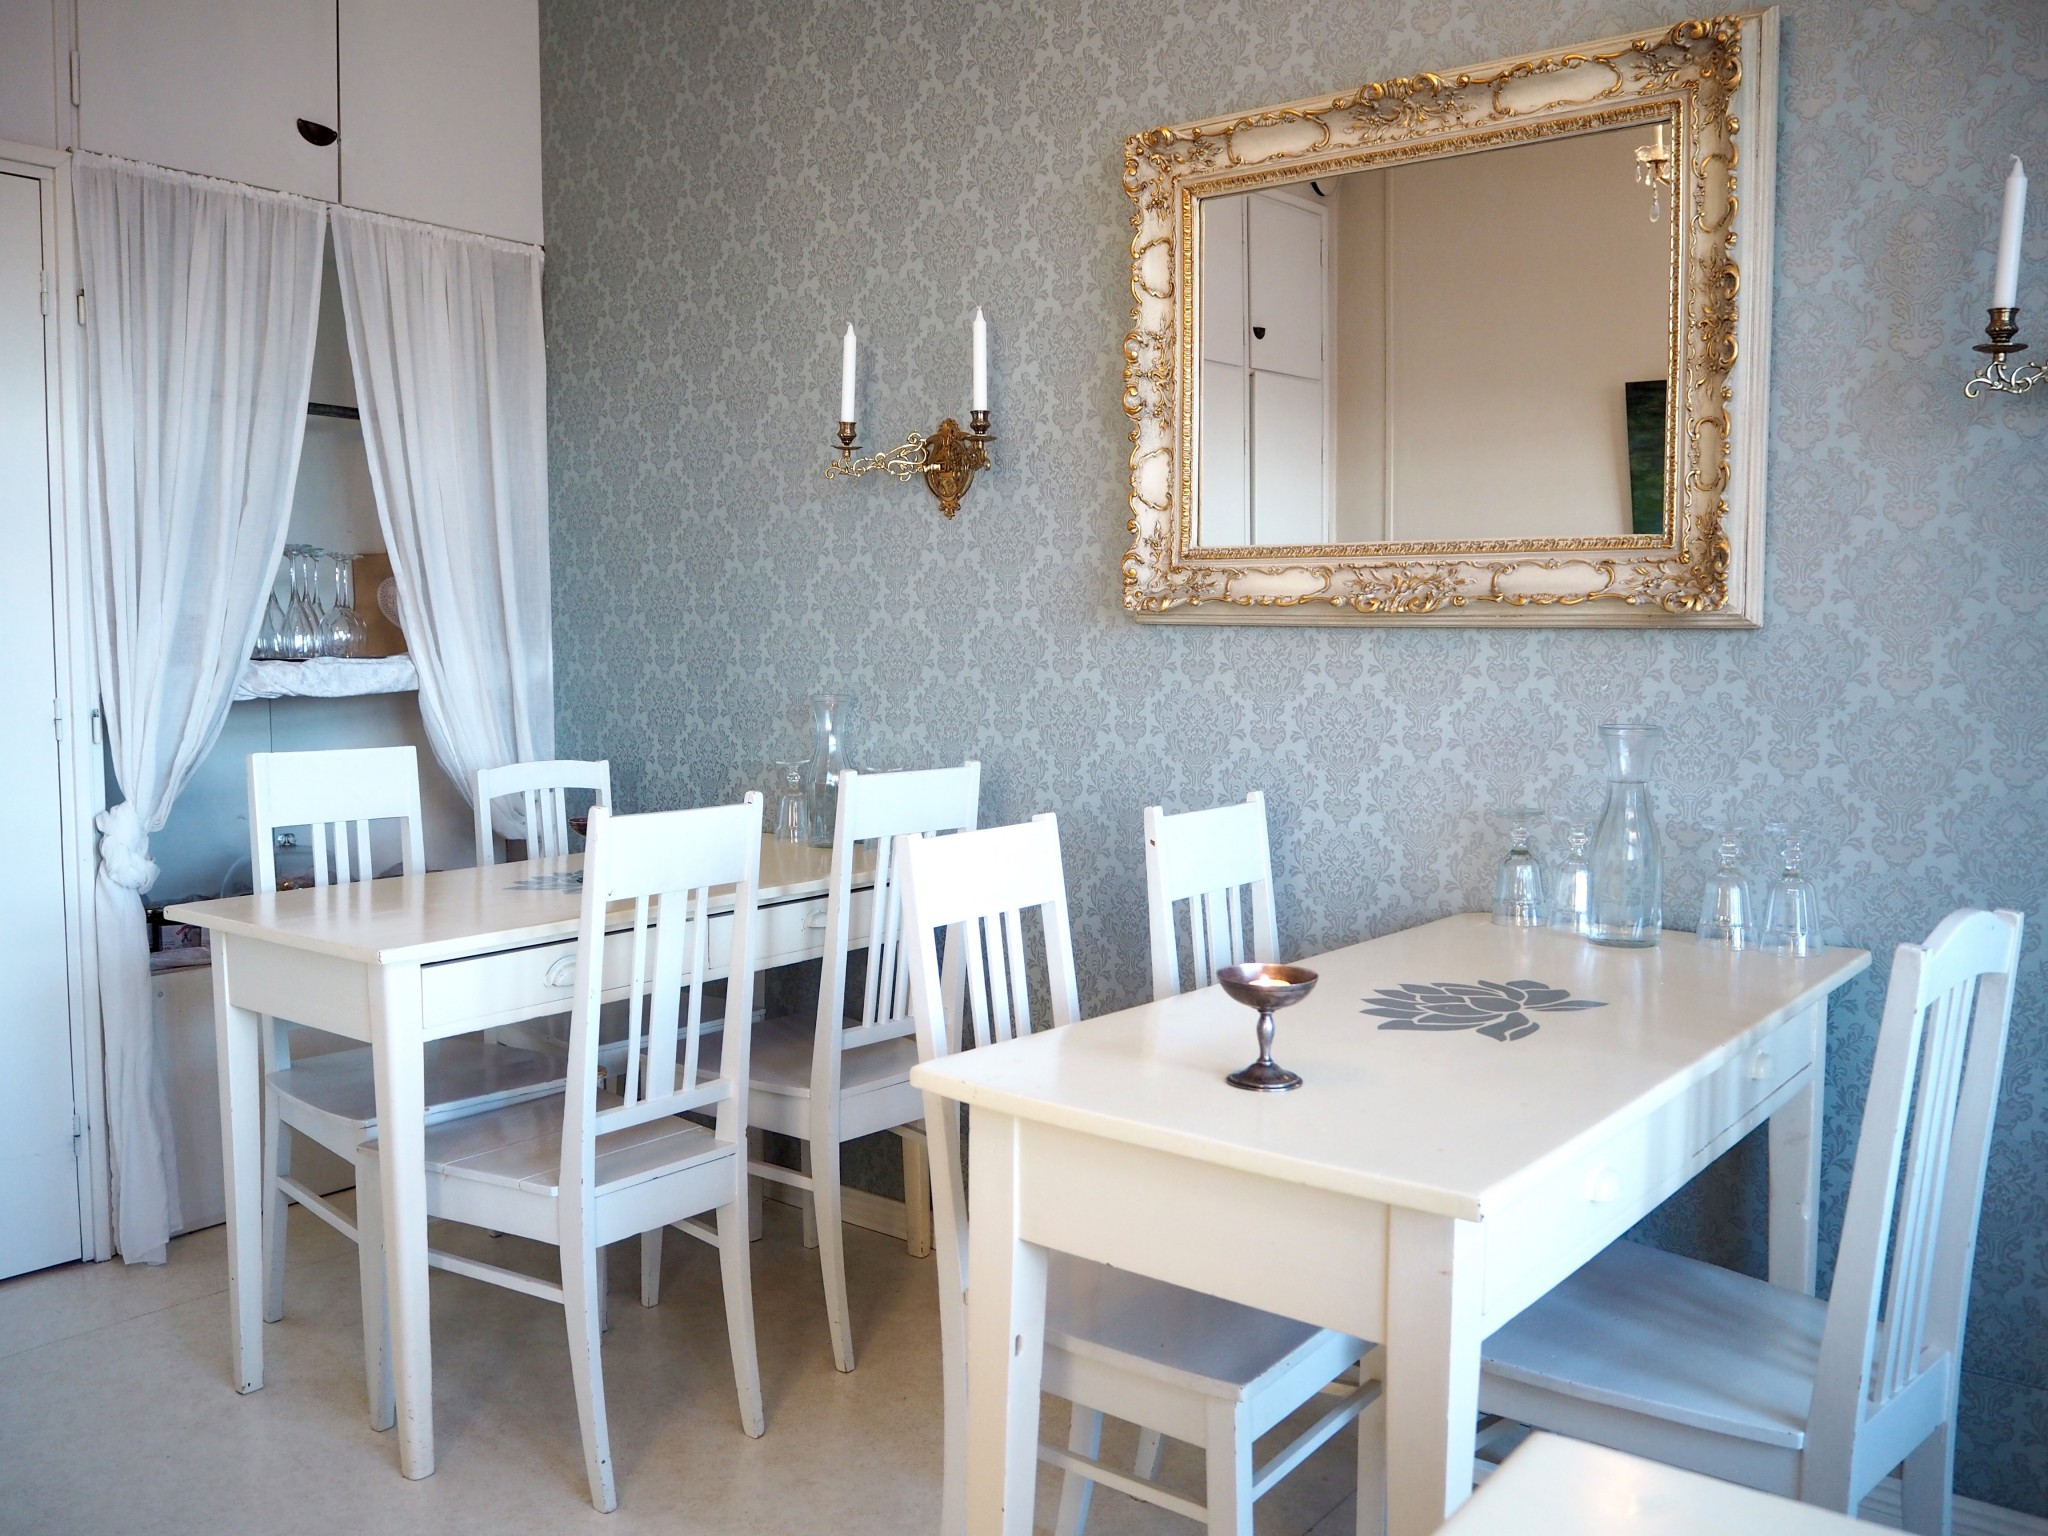 Ani's Cafe Porvoo